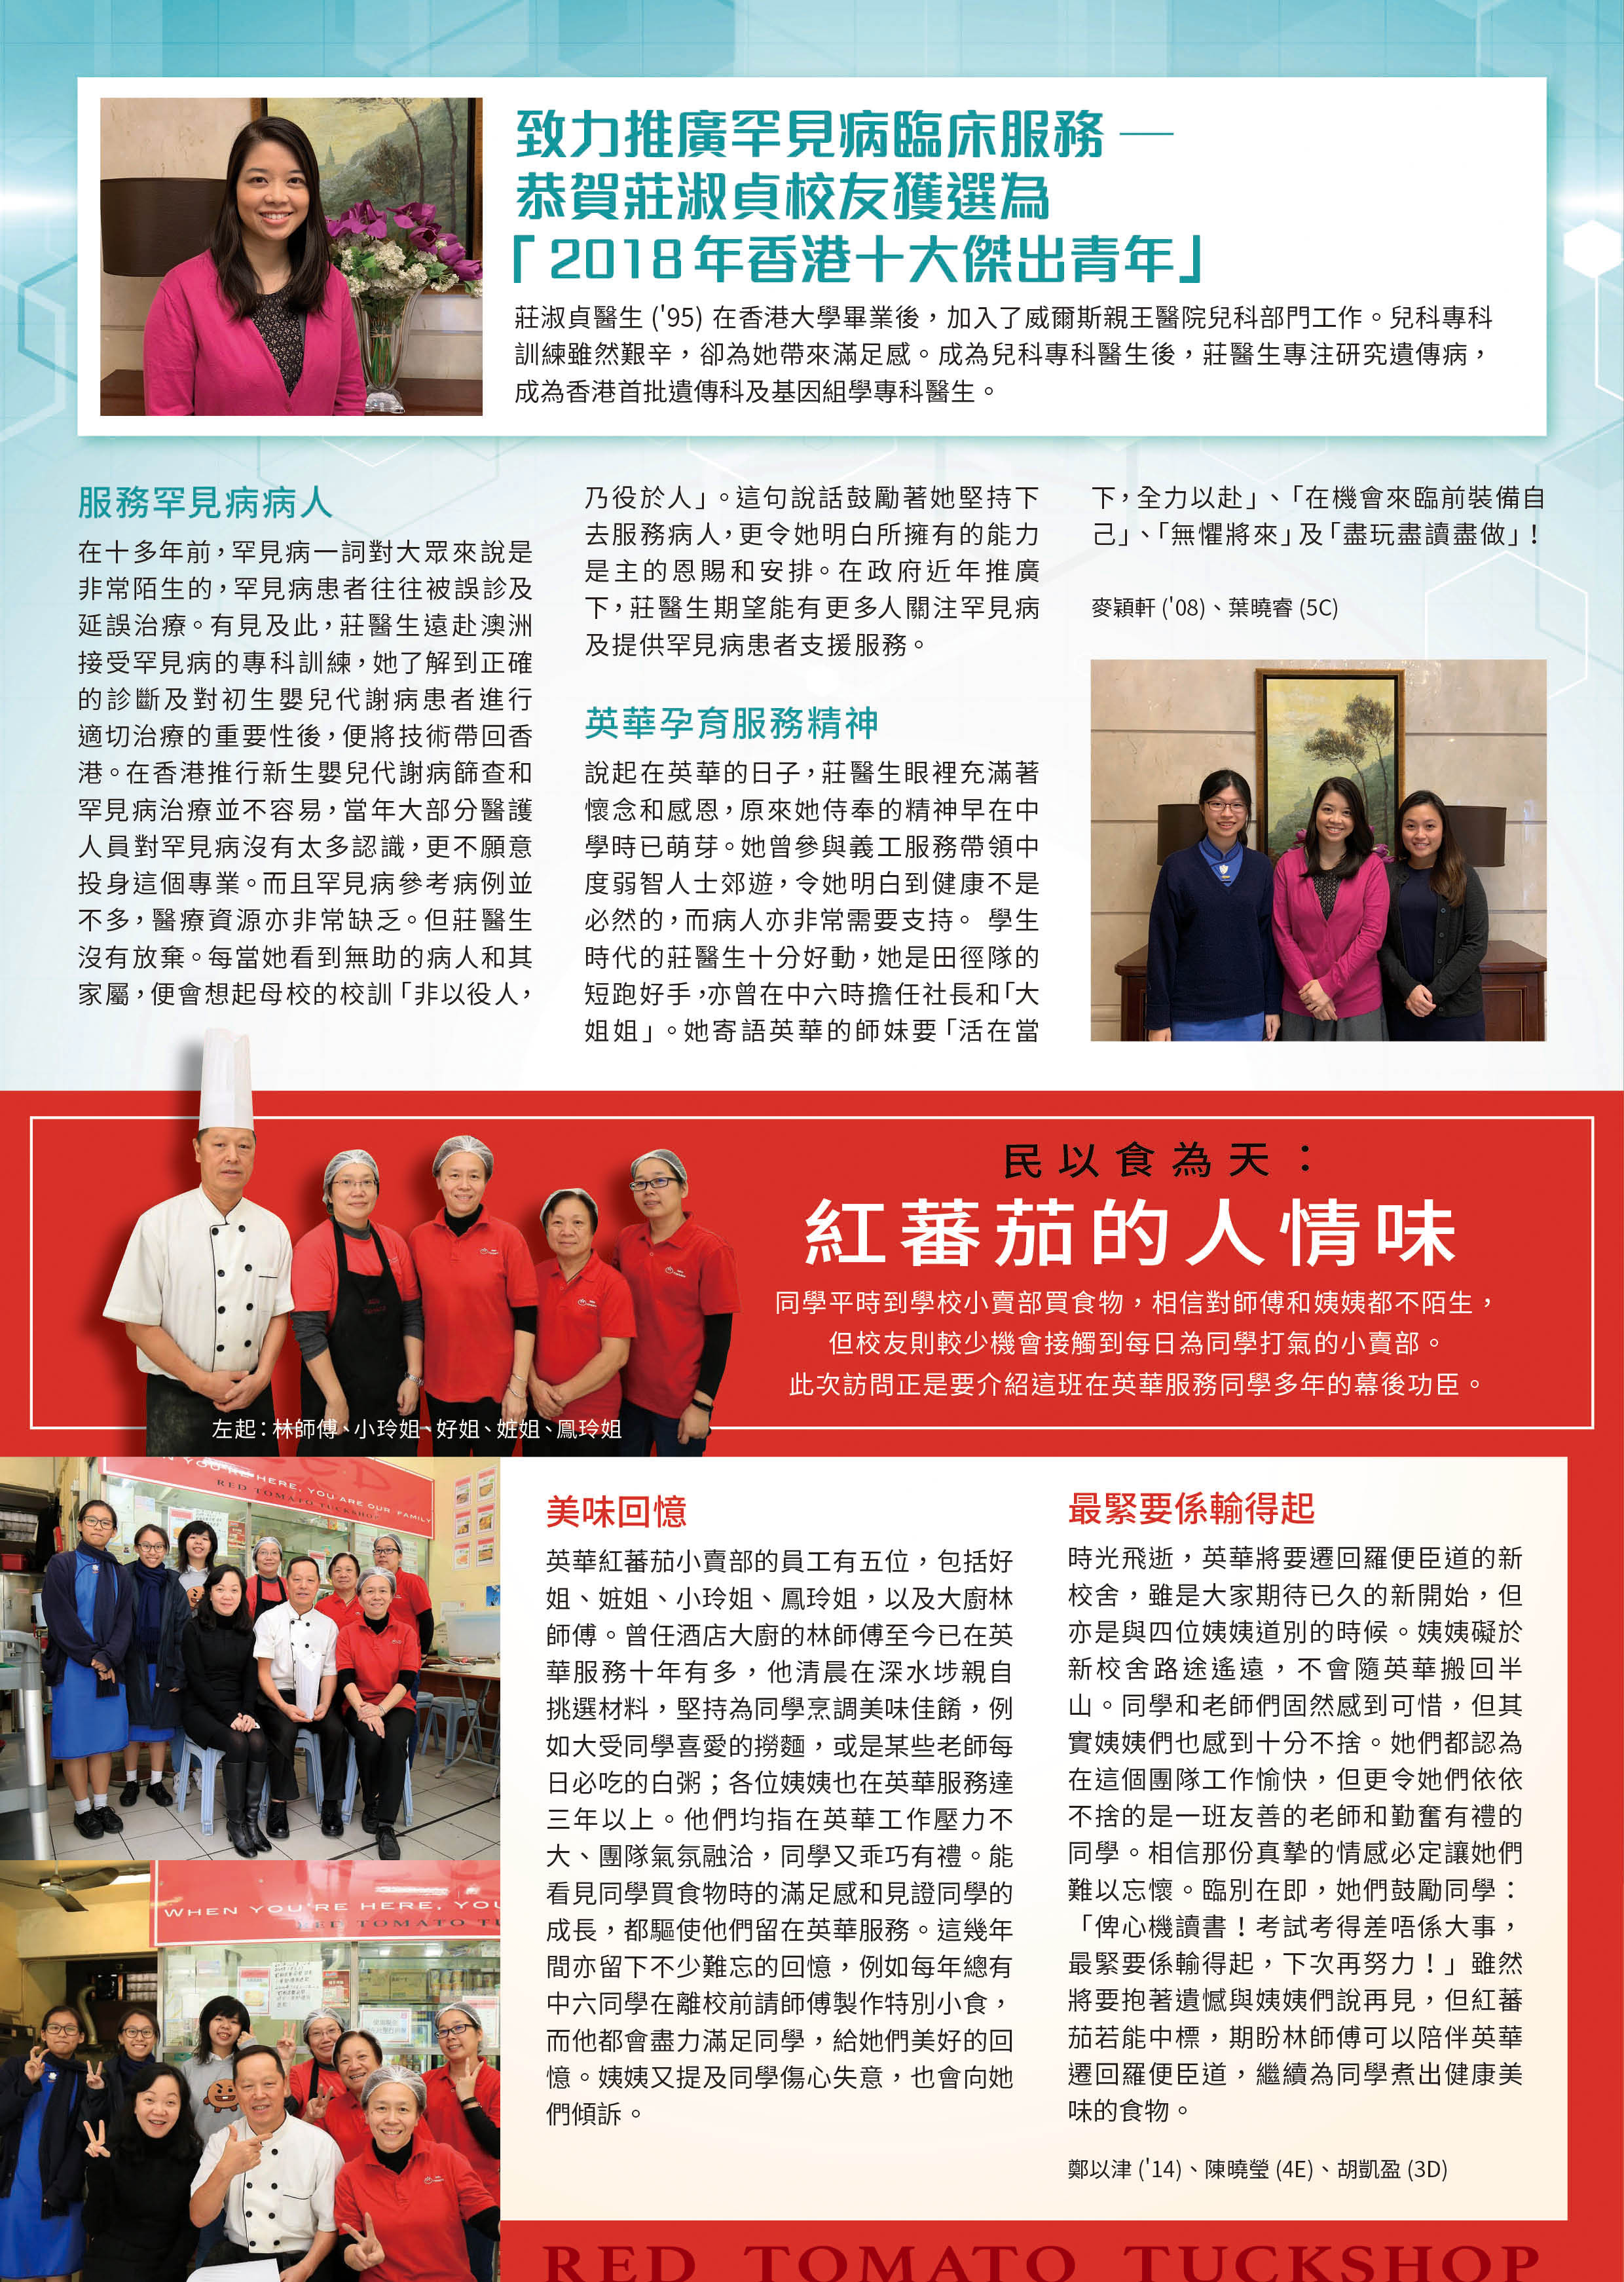 YWGSAA Newsletter (Feb 2019)   英華女校校友會YWGSAA